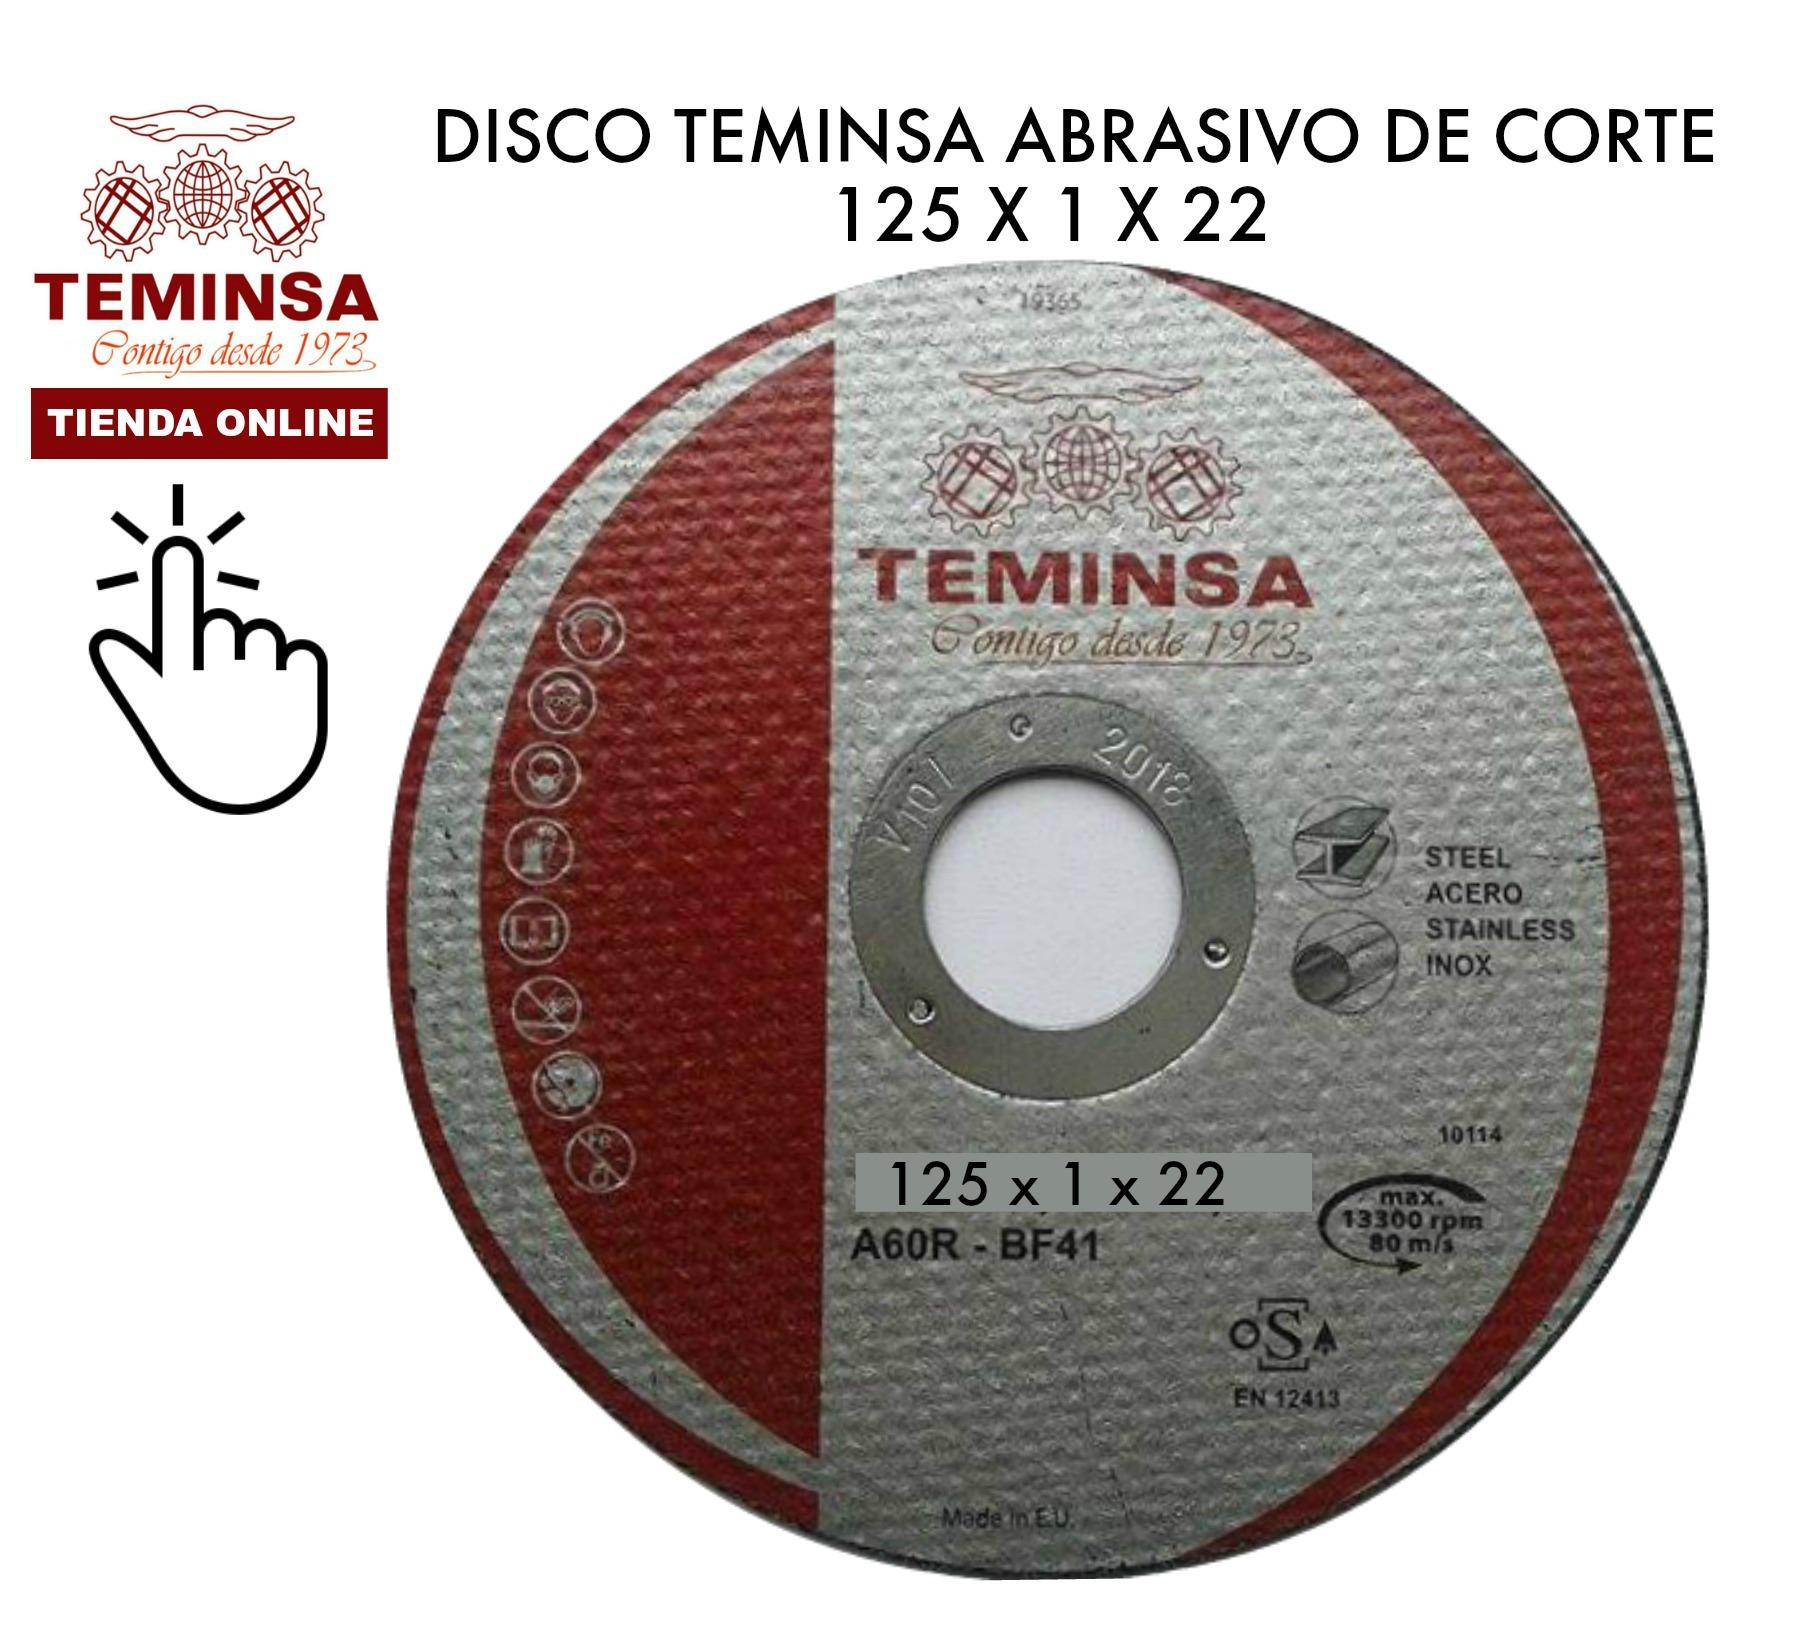 Disco Abrasivo de Corte Teminsa 125x1x22 Tienda Online